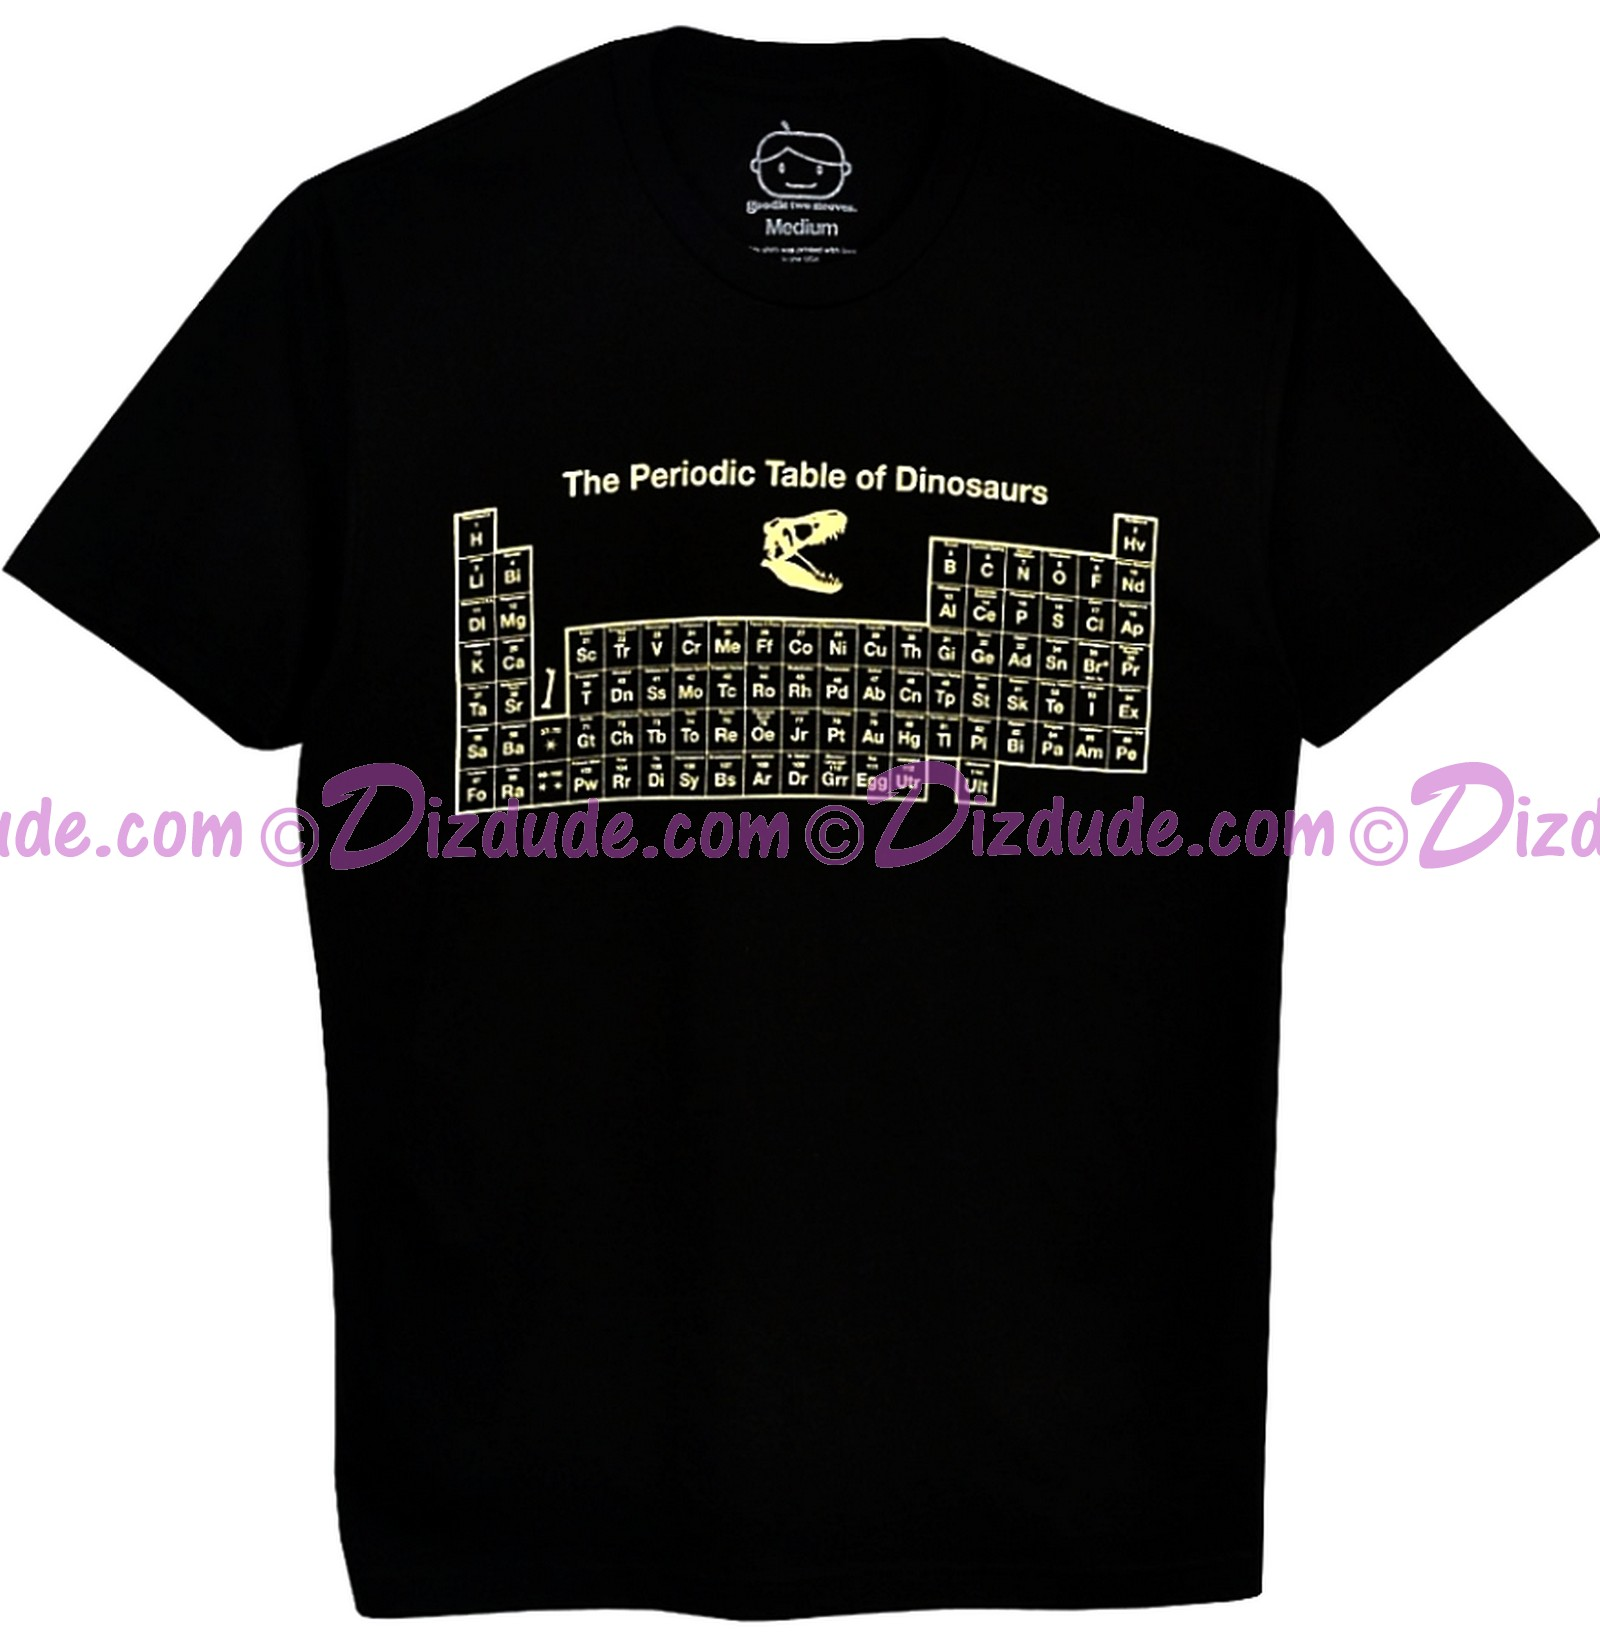 Periodic Table of Dinosaur Adult T-shirt (Tee, Tshirt or T shirt) - Disney Animal Kingdom Dino Institute